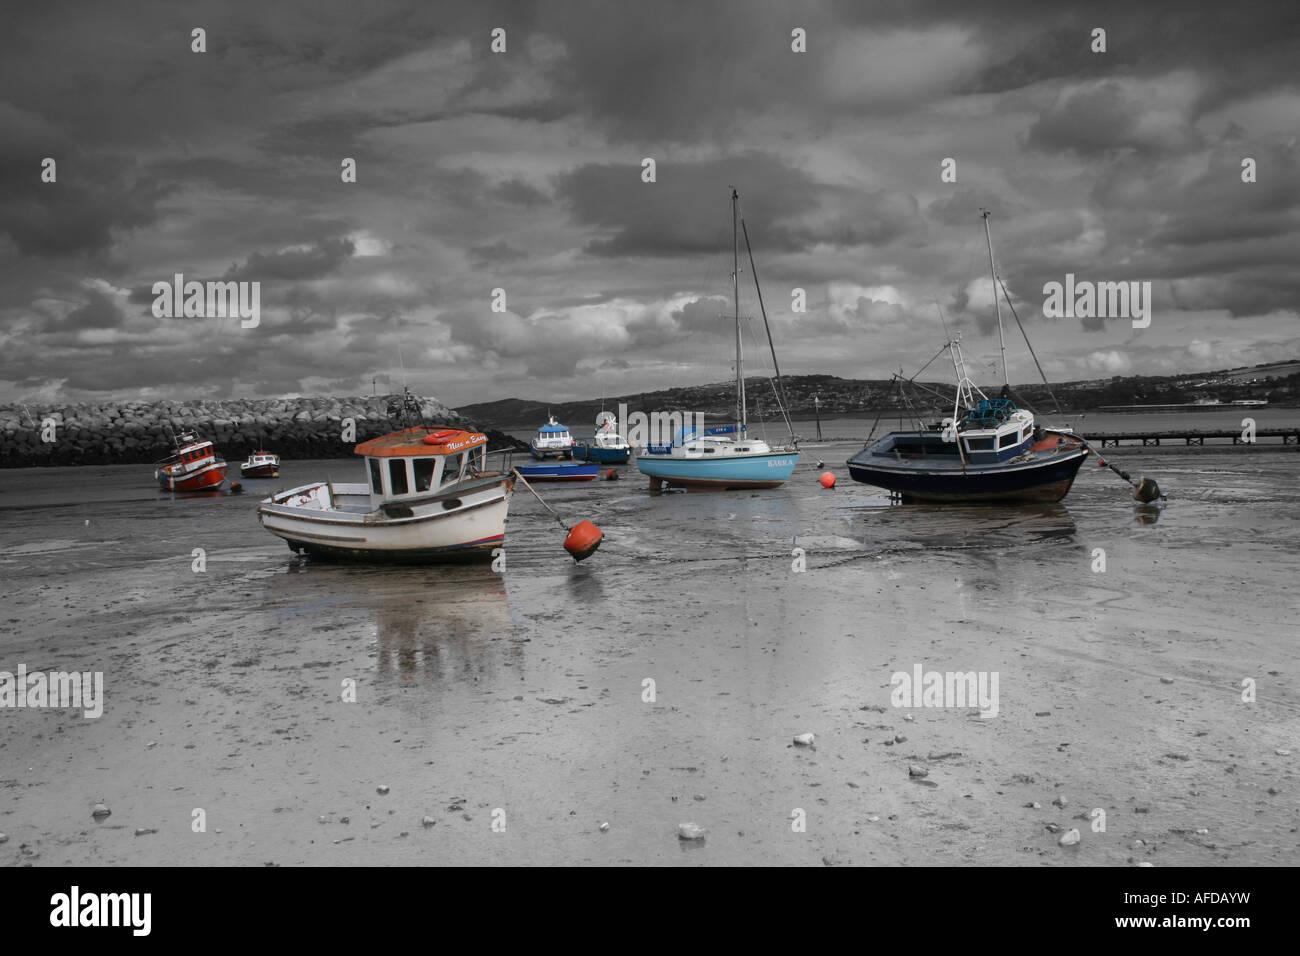 Boats at Rhos on Sea - Stock Image